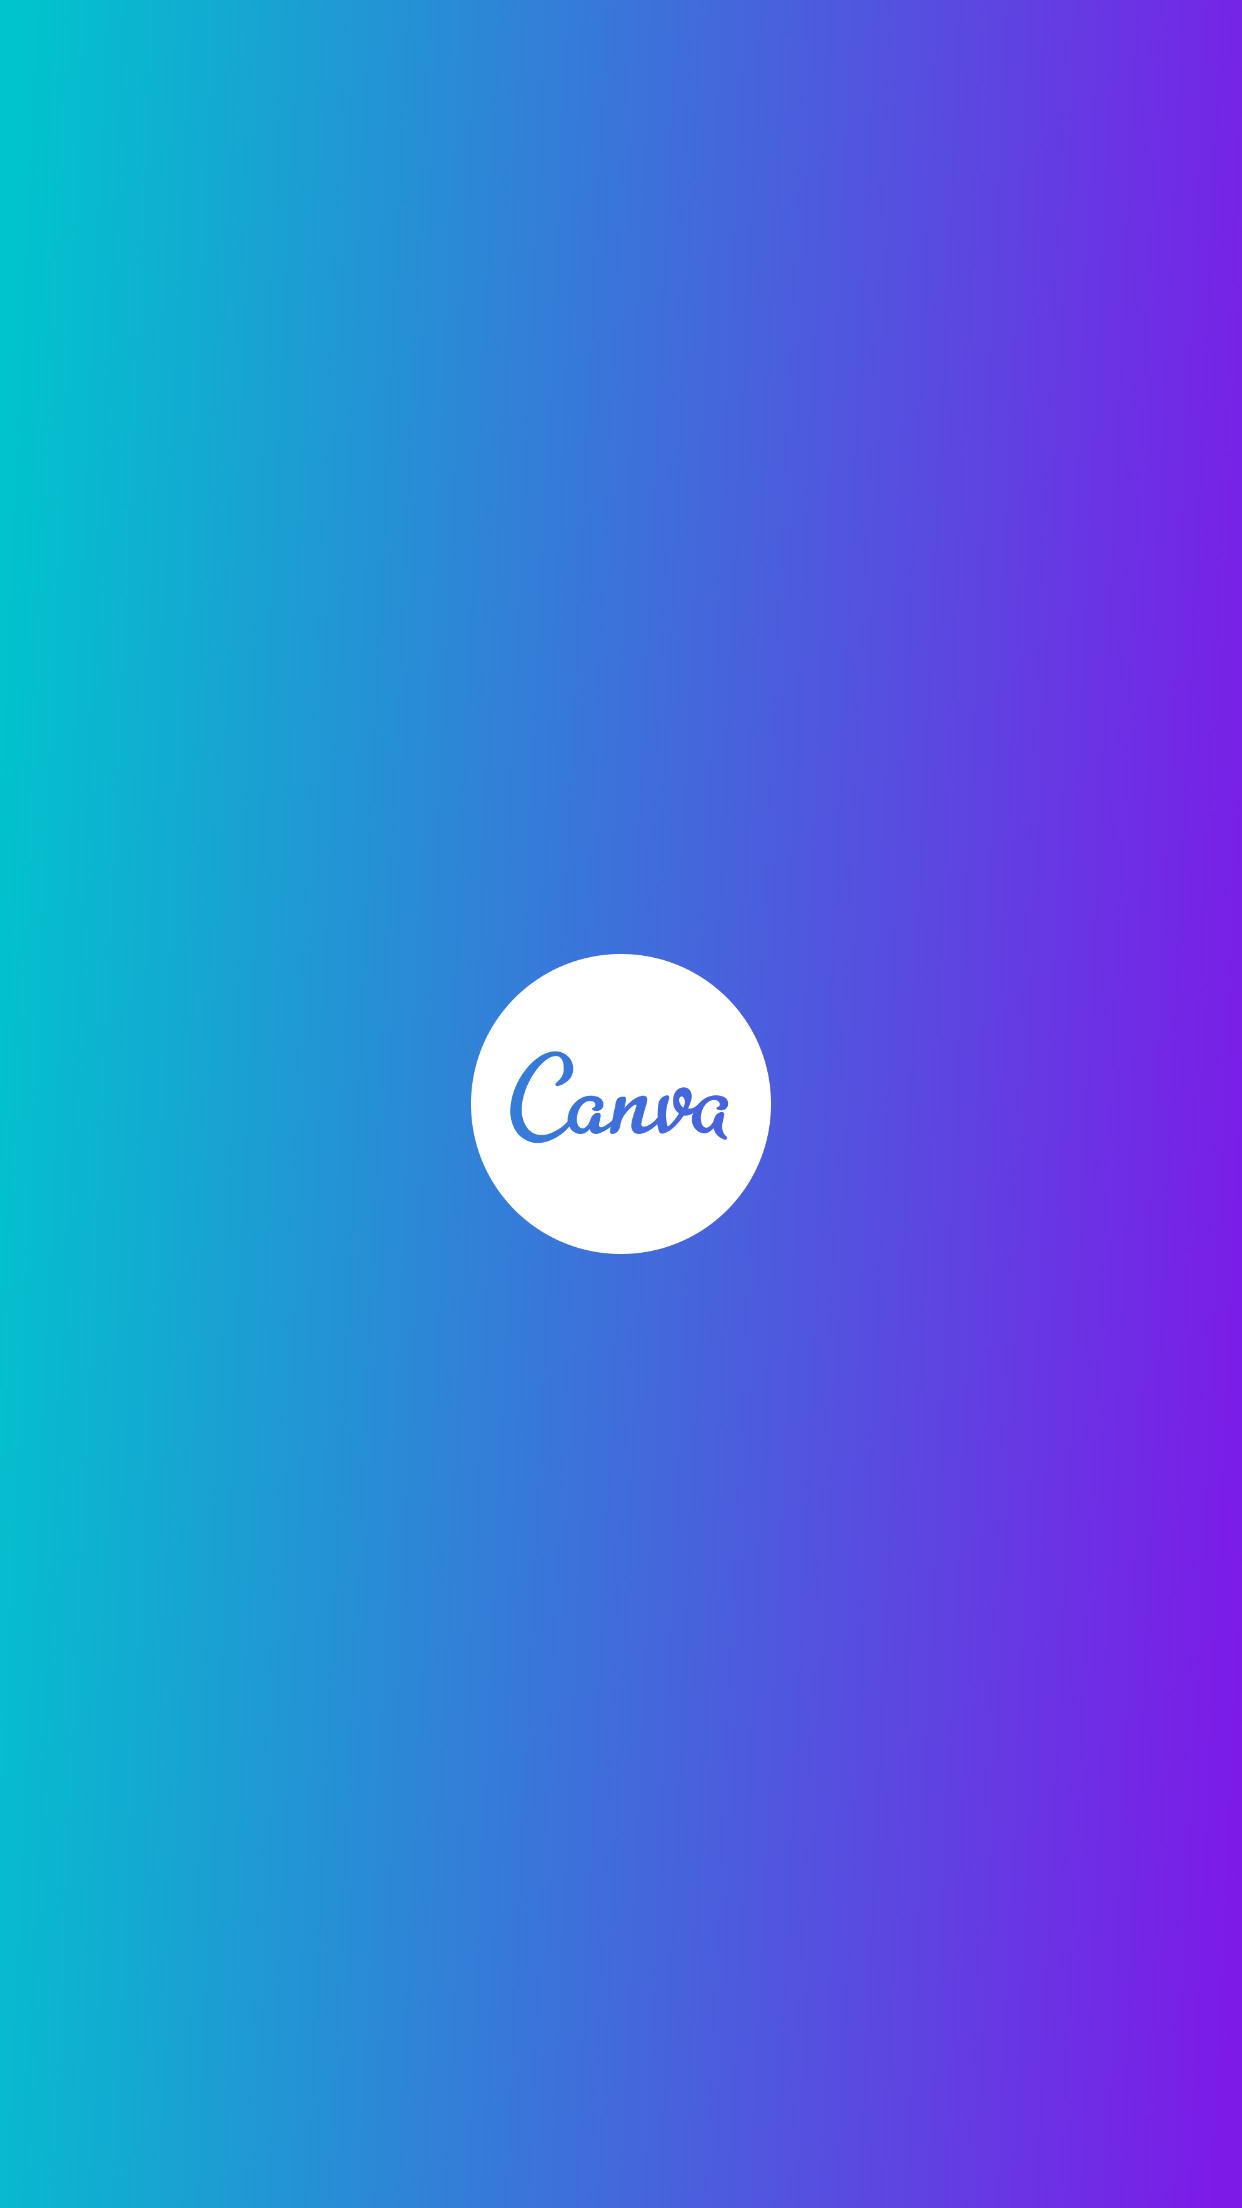 aplikacje do insta story canva